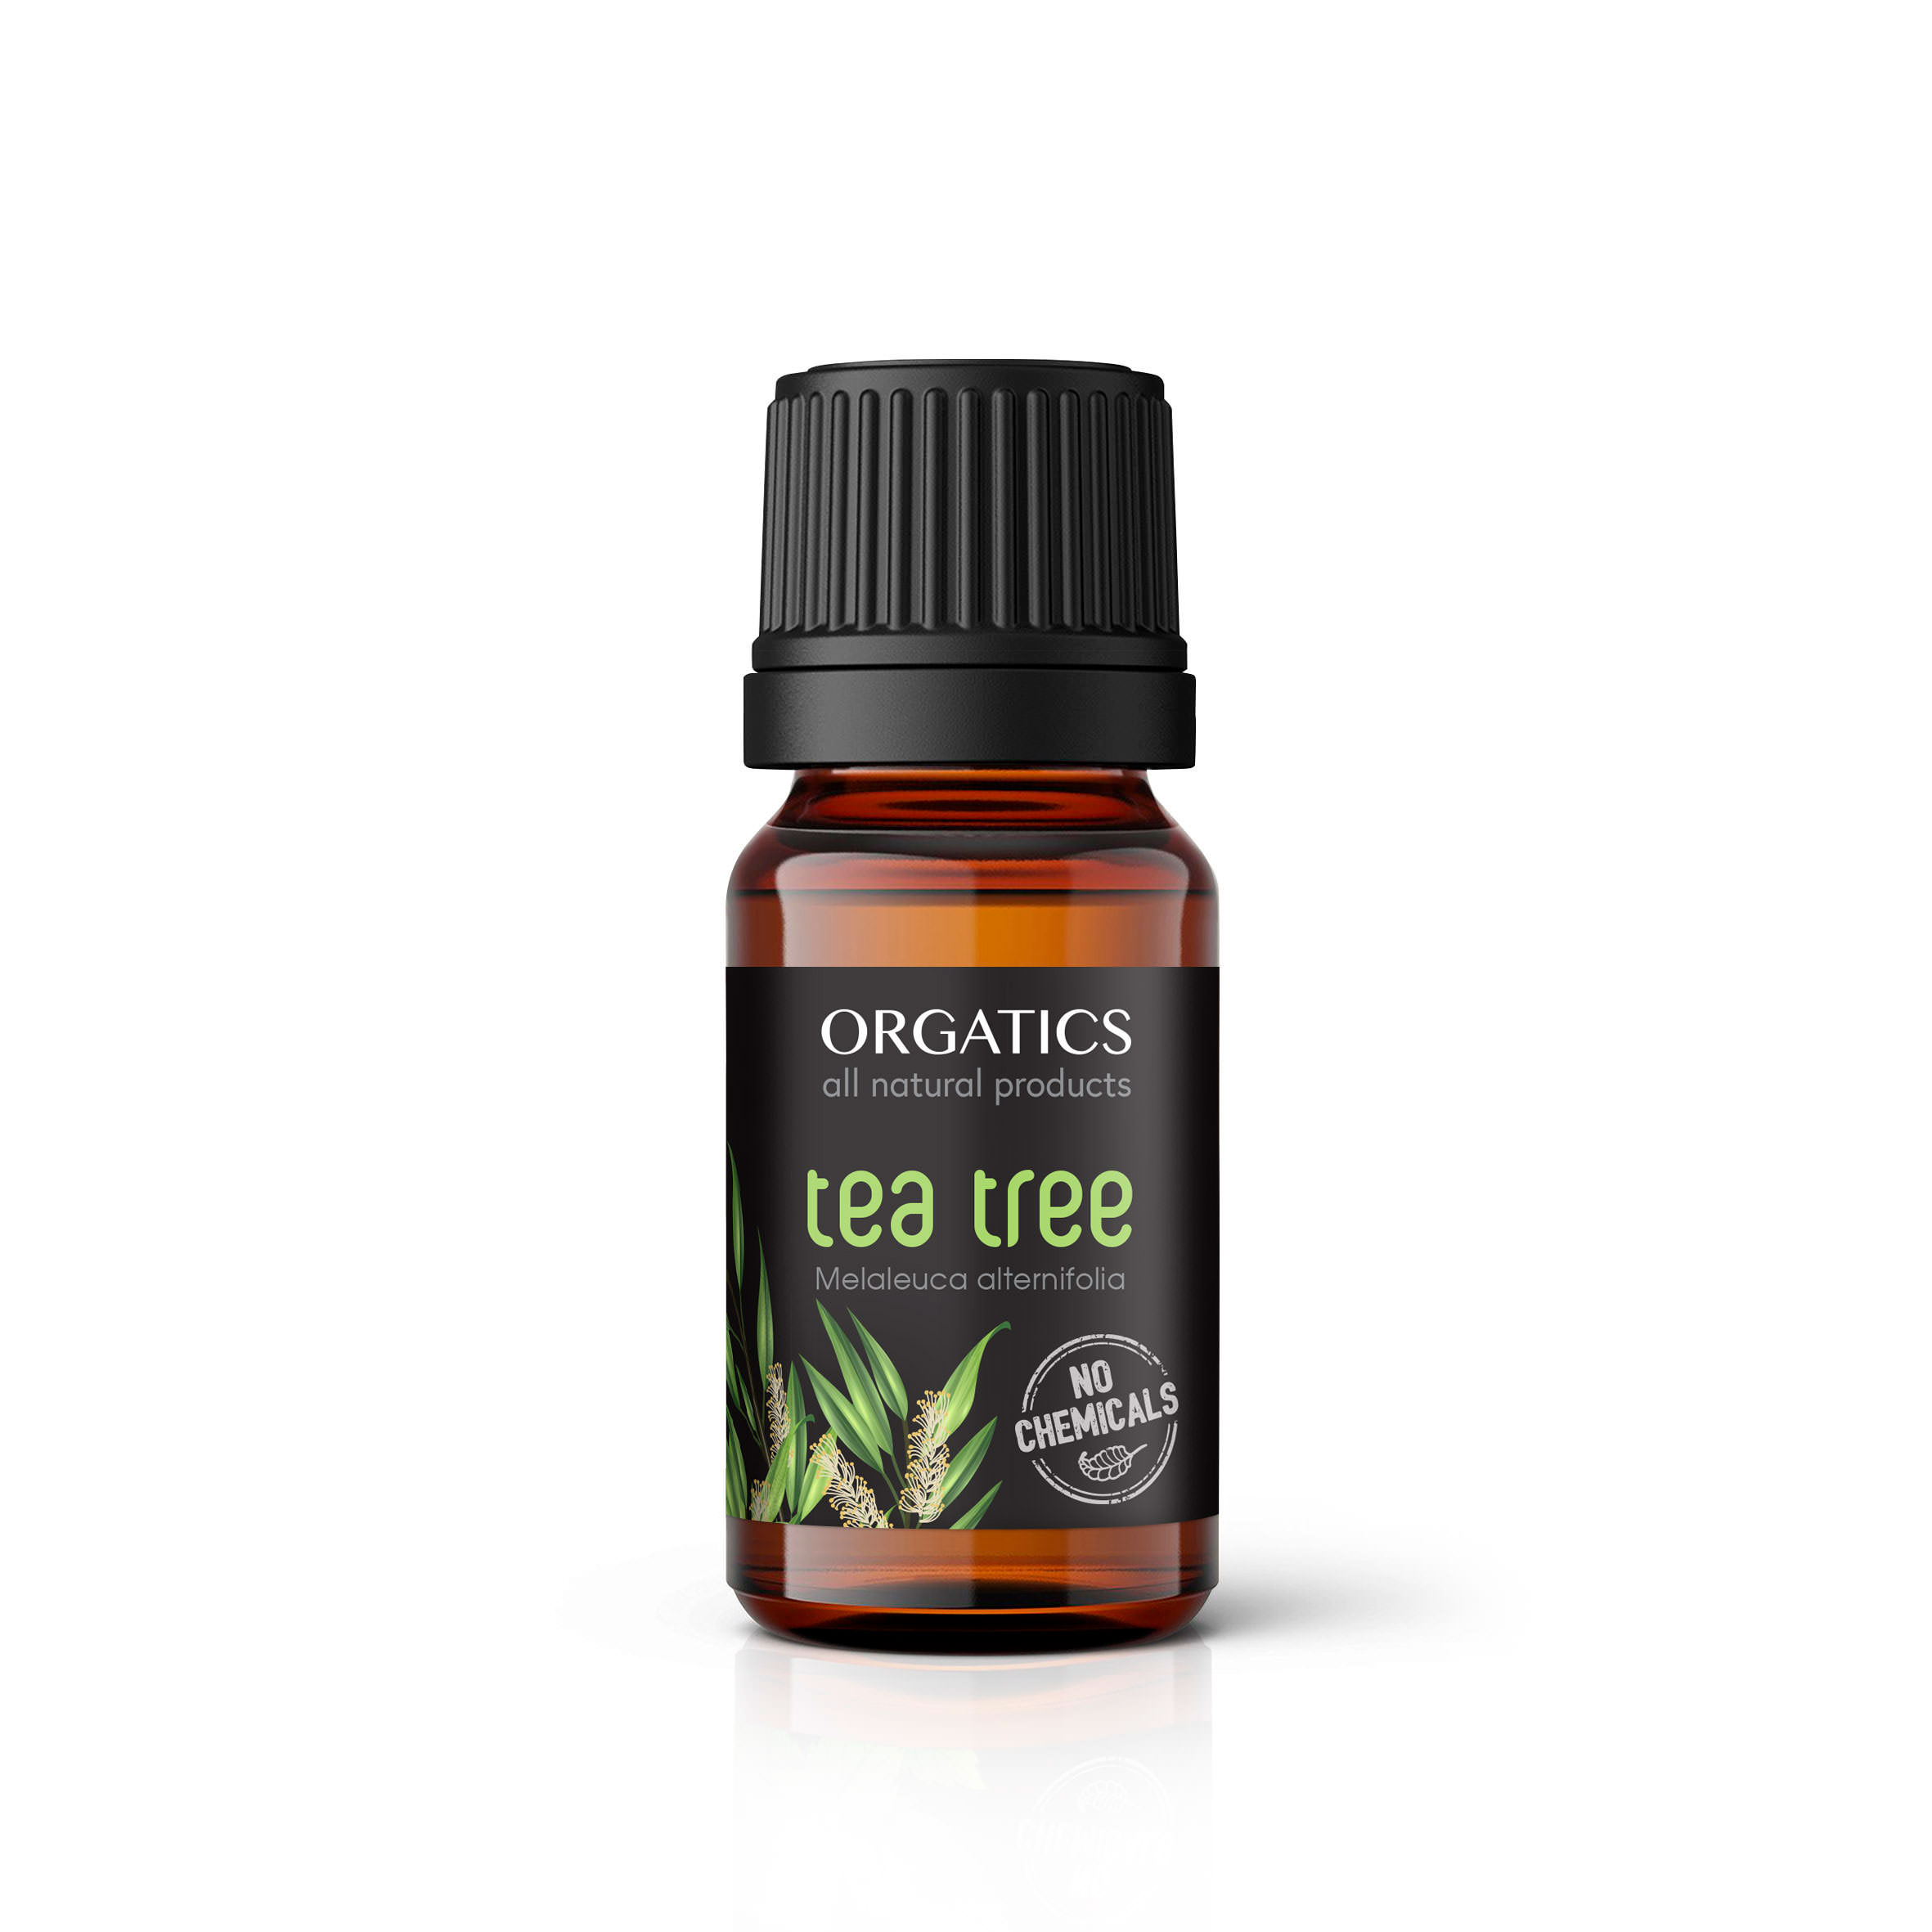 ORGATICS Tea Tree Orange Oil